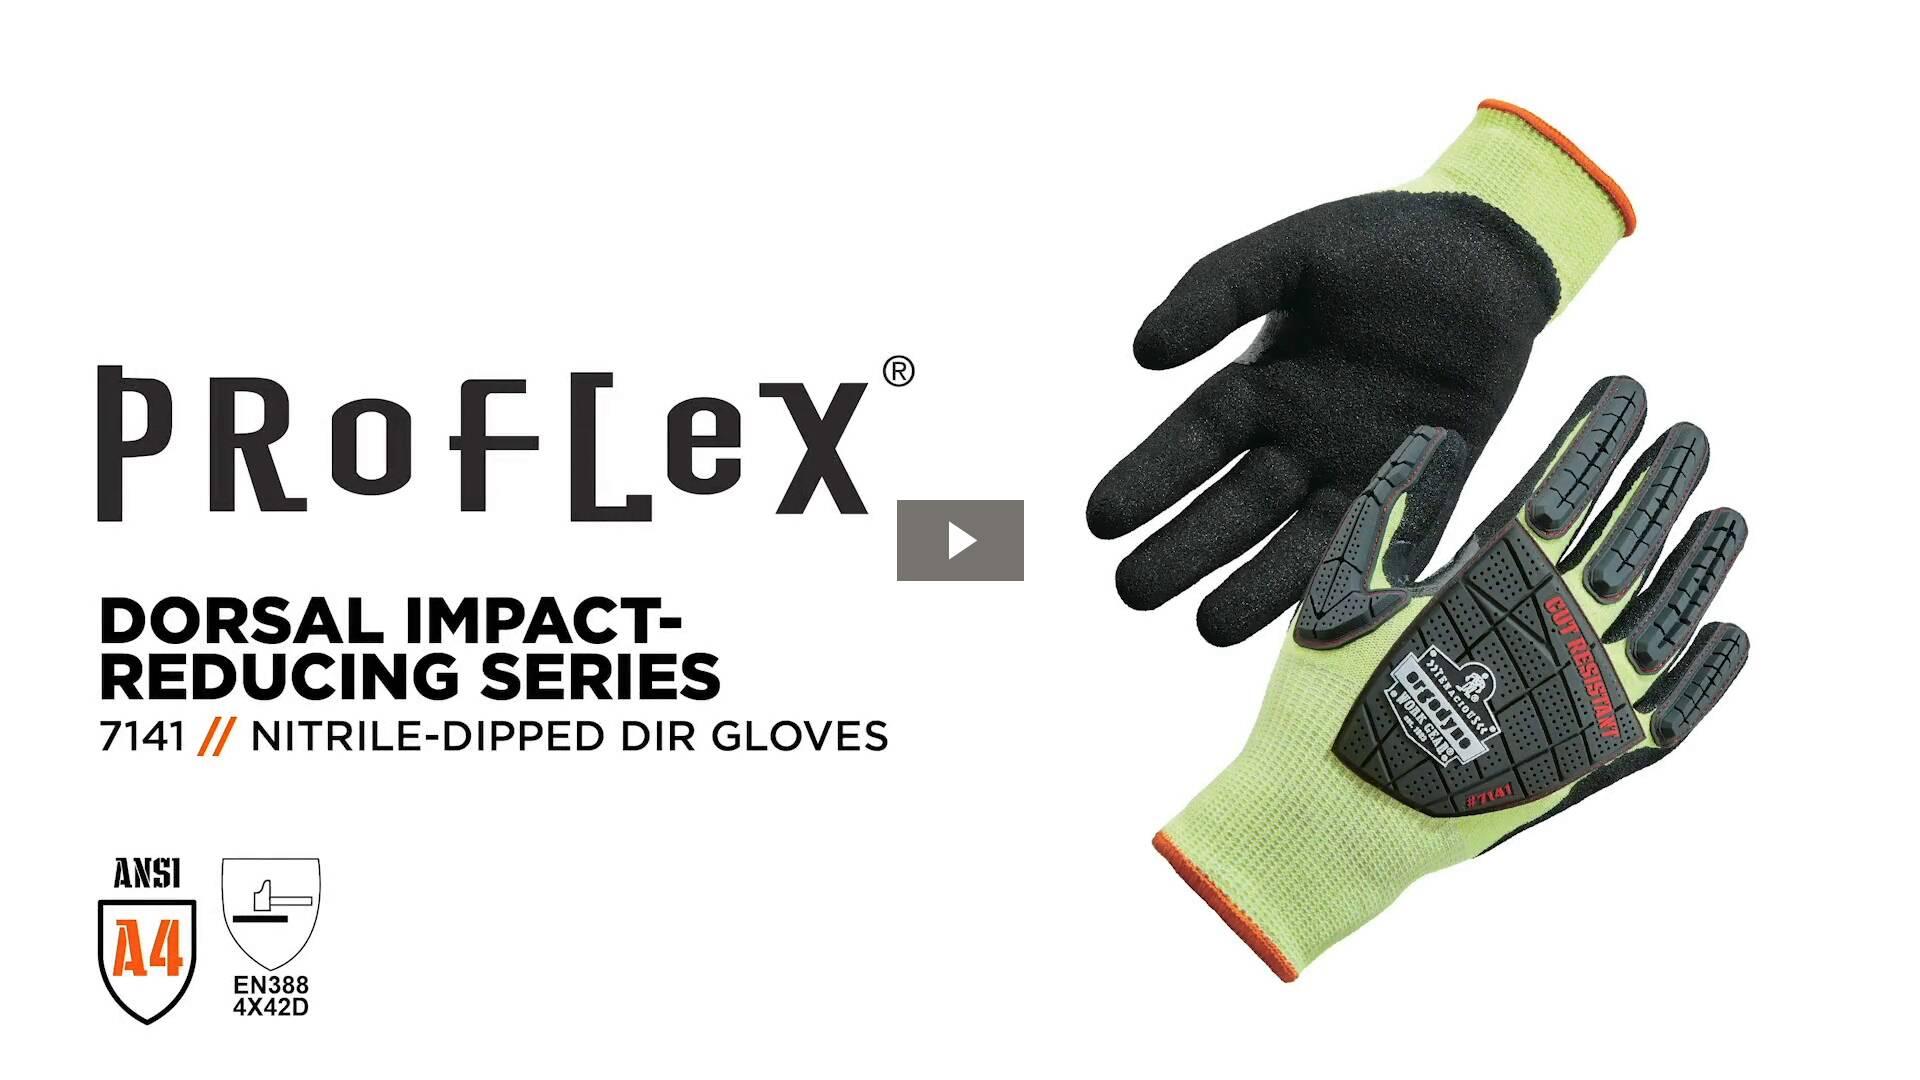 Ergodyne Product Video - ProFlex<sup>®</sup> 7141 Hi-Vis Nitrile-Coated DIR Level 4 Cut-Resistant Gloves